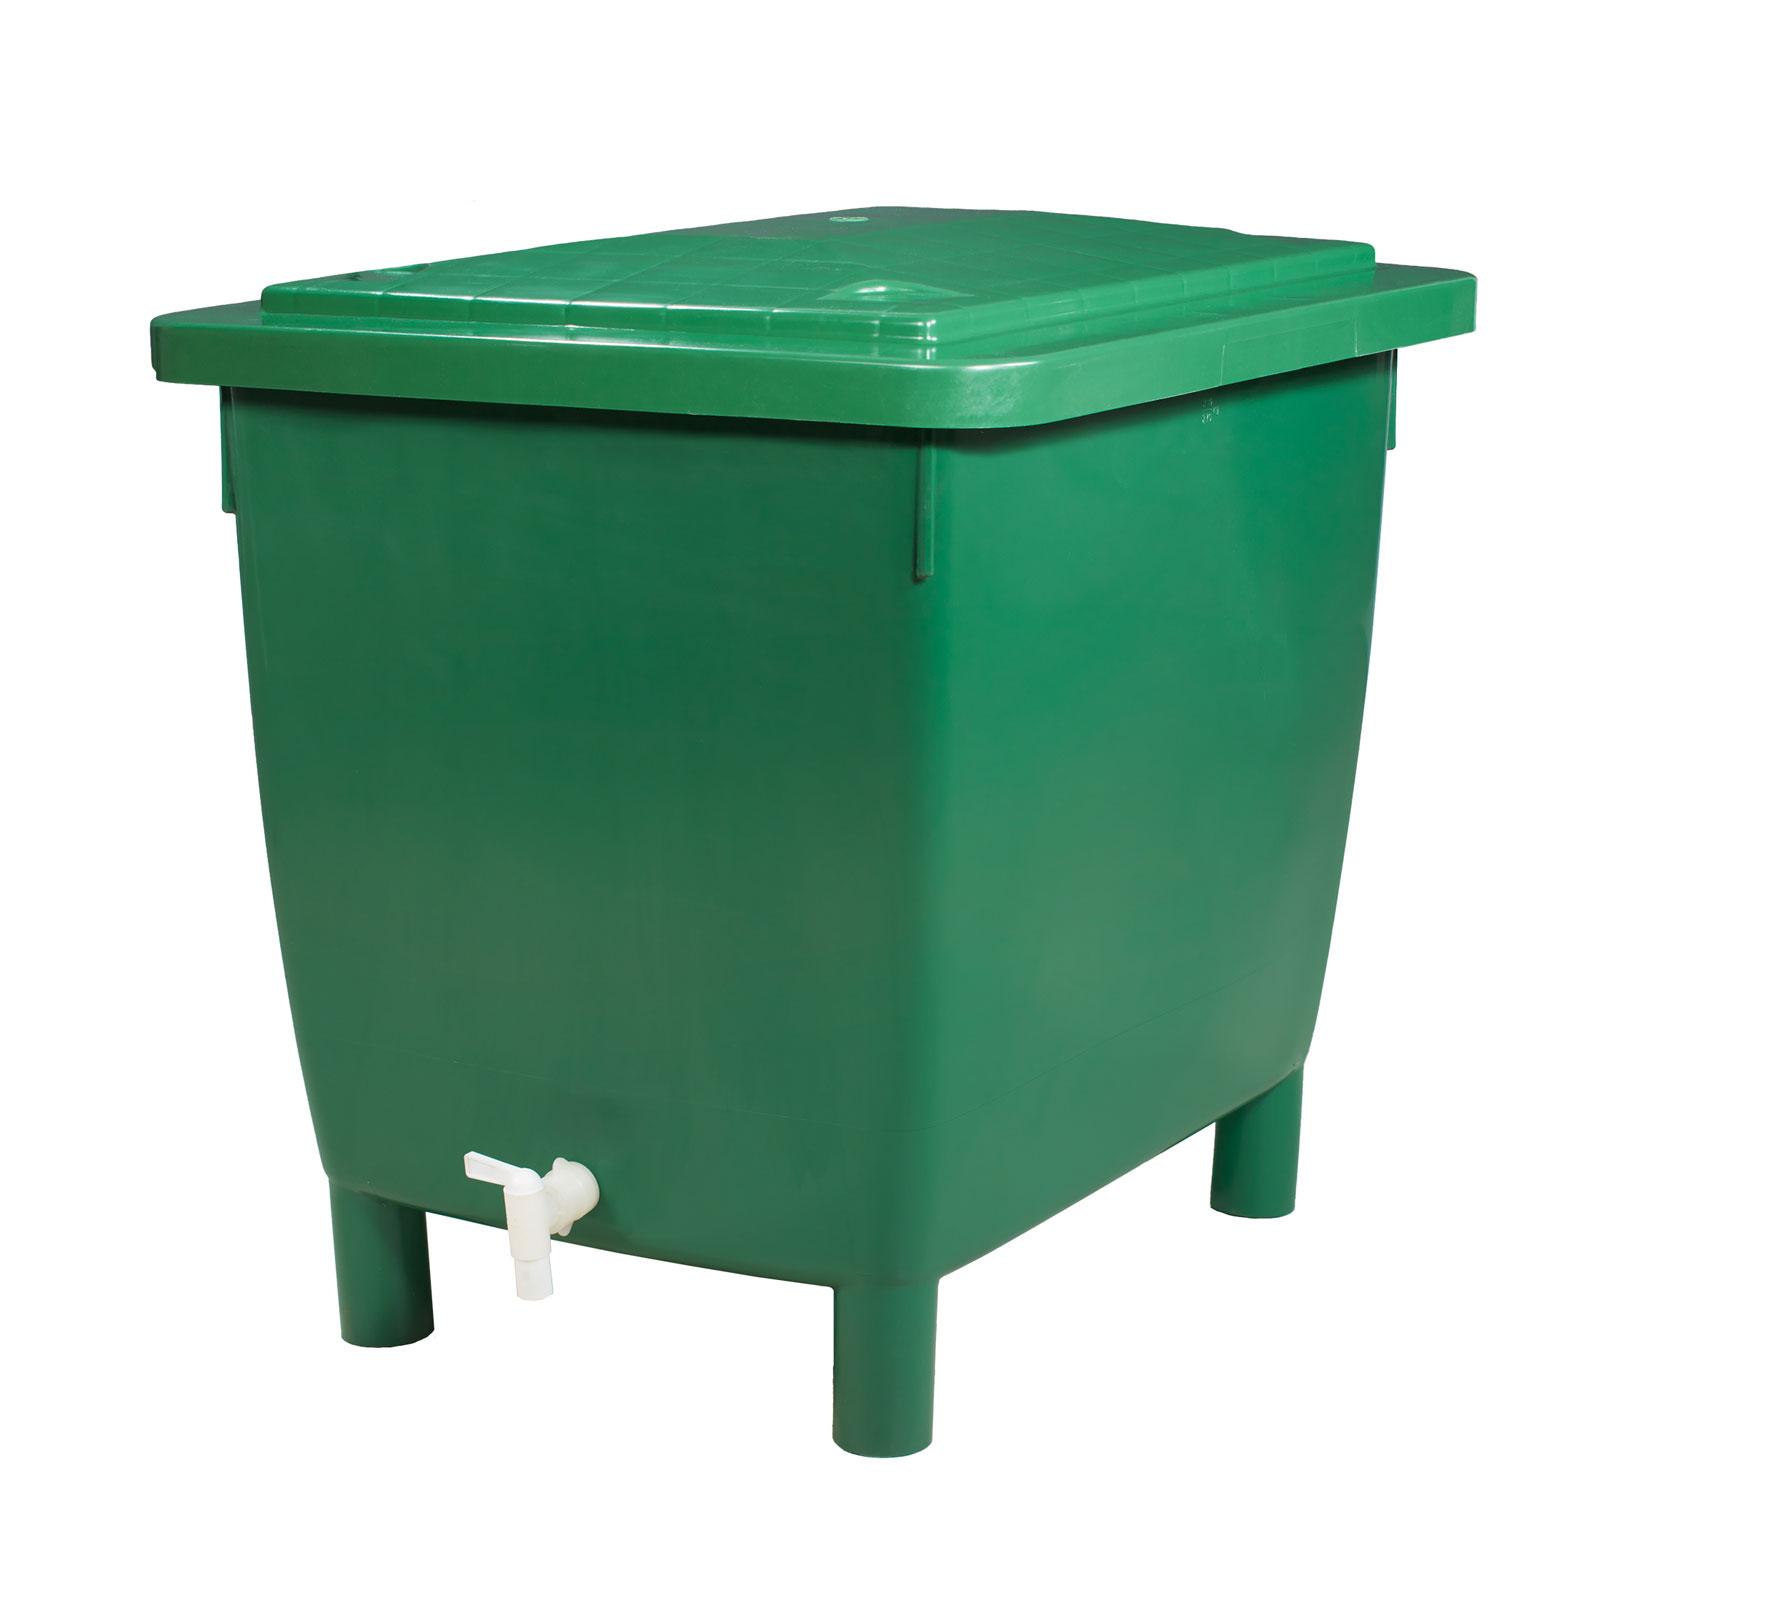 Regentonne eckig 400 Liter grün GARANTIA 501202 Bild 7